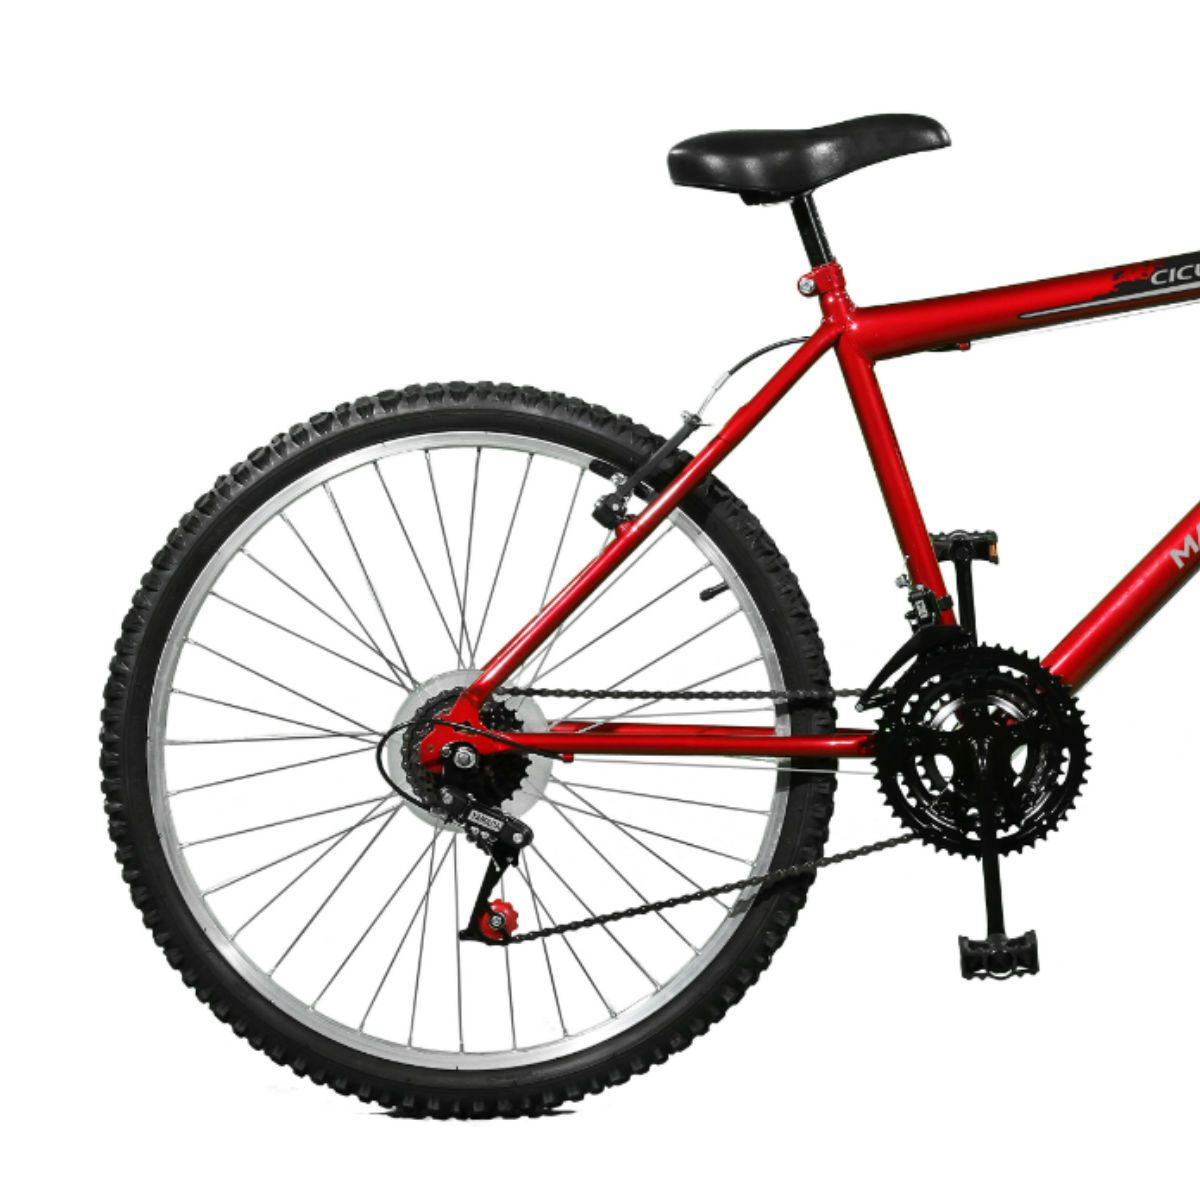 Bicicleta Master Bike Aro 26 Ciclone Plus 21 Marchas V-Brake Vermelho/Preto